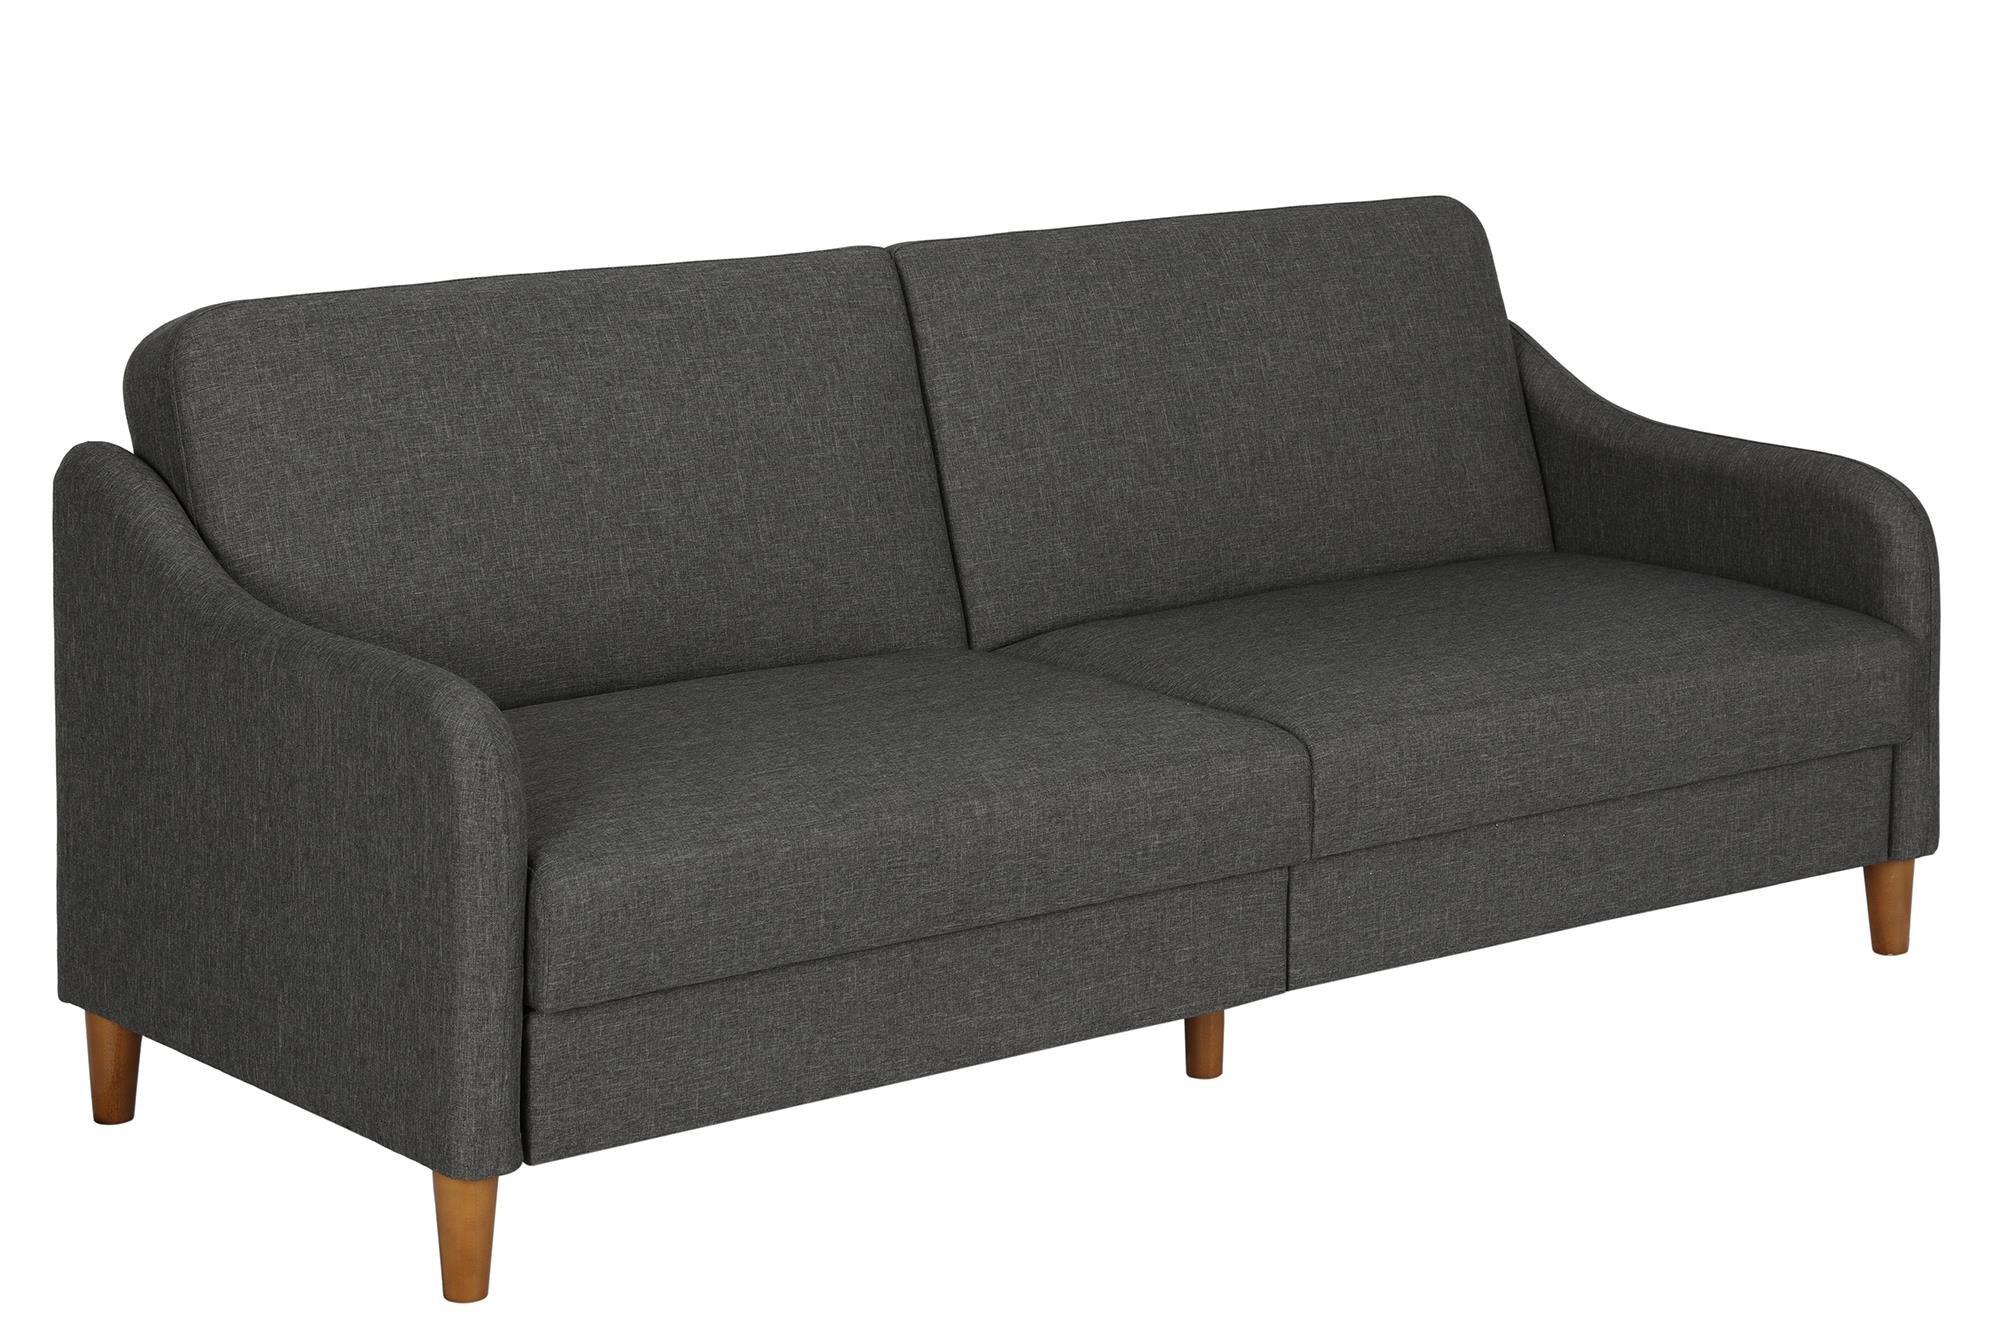 DHP Jasper Linen Upholstered Coil Futon, Multi-Position Back, Converts to Sleeper, Grey